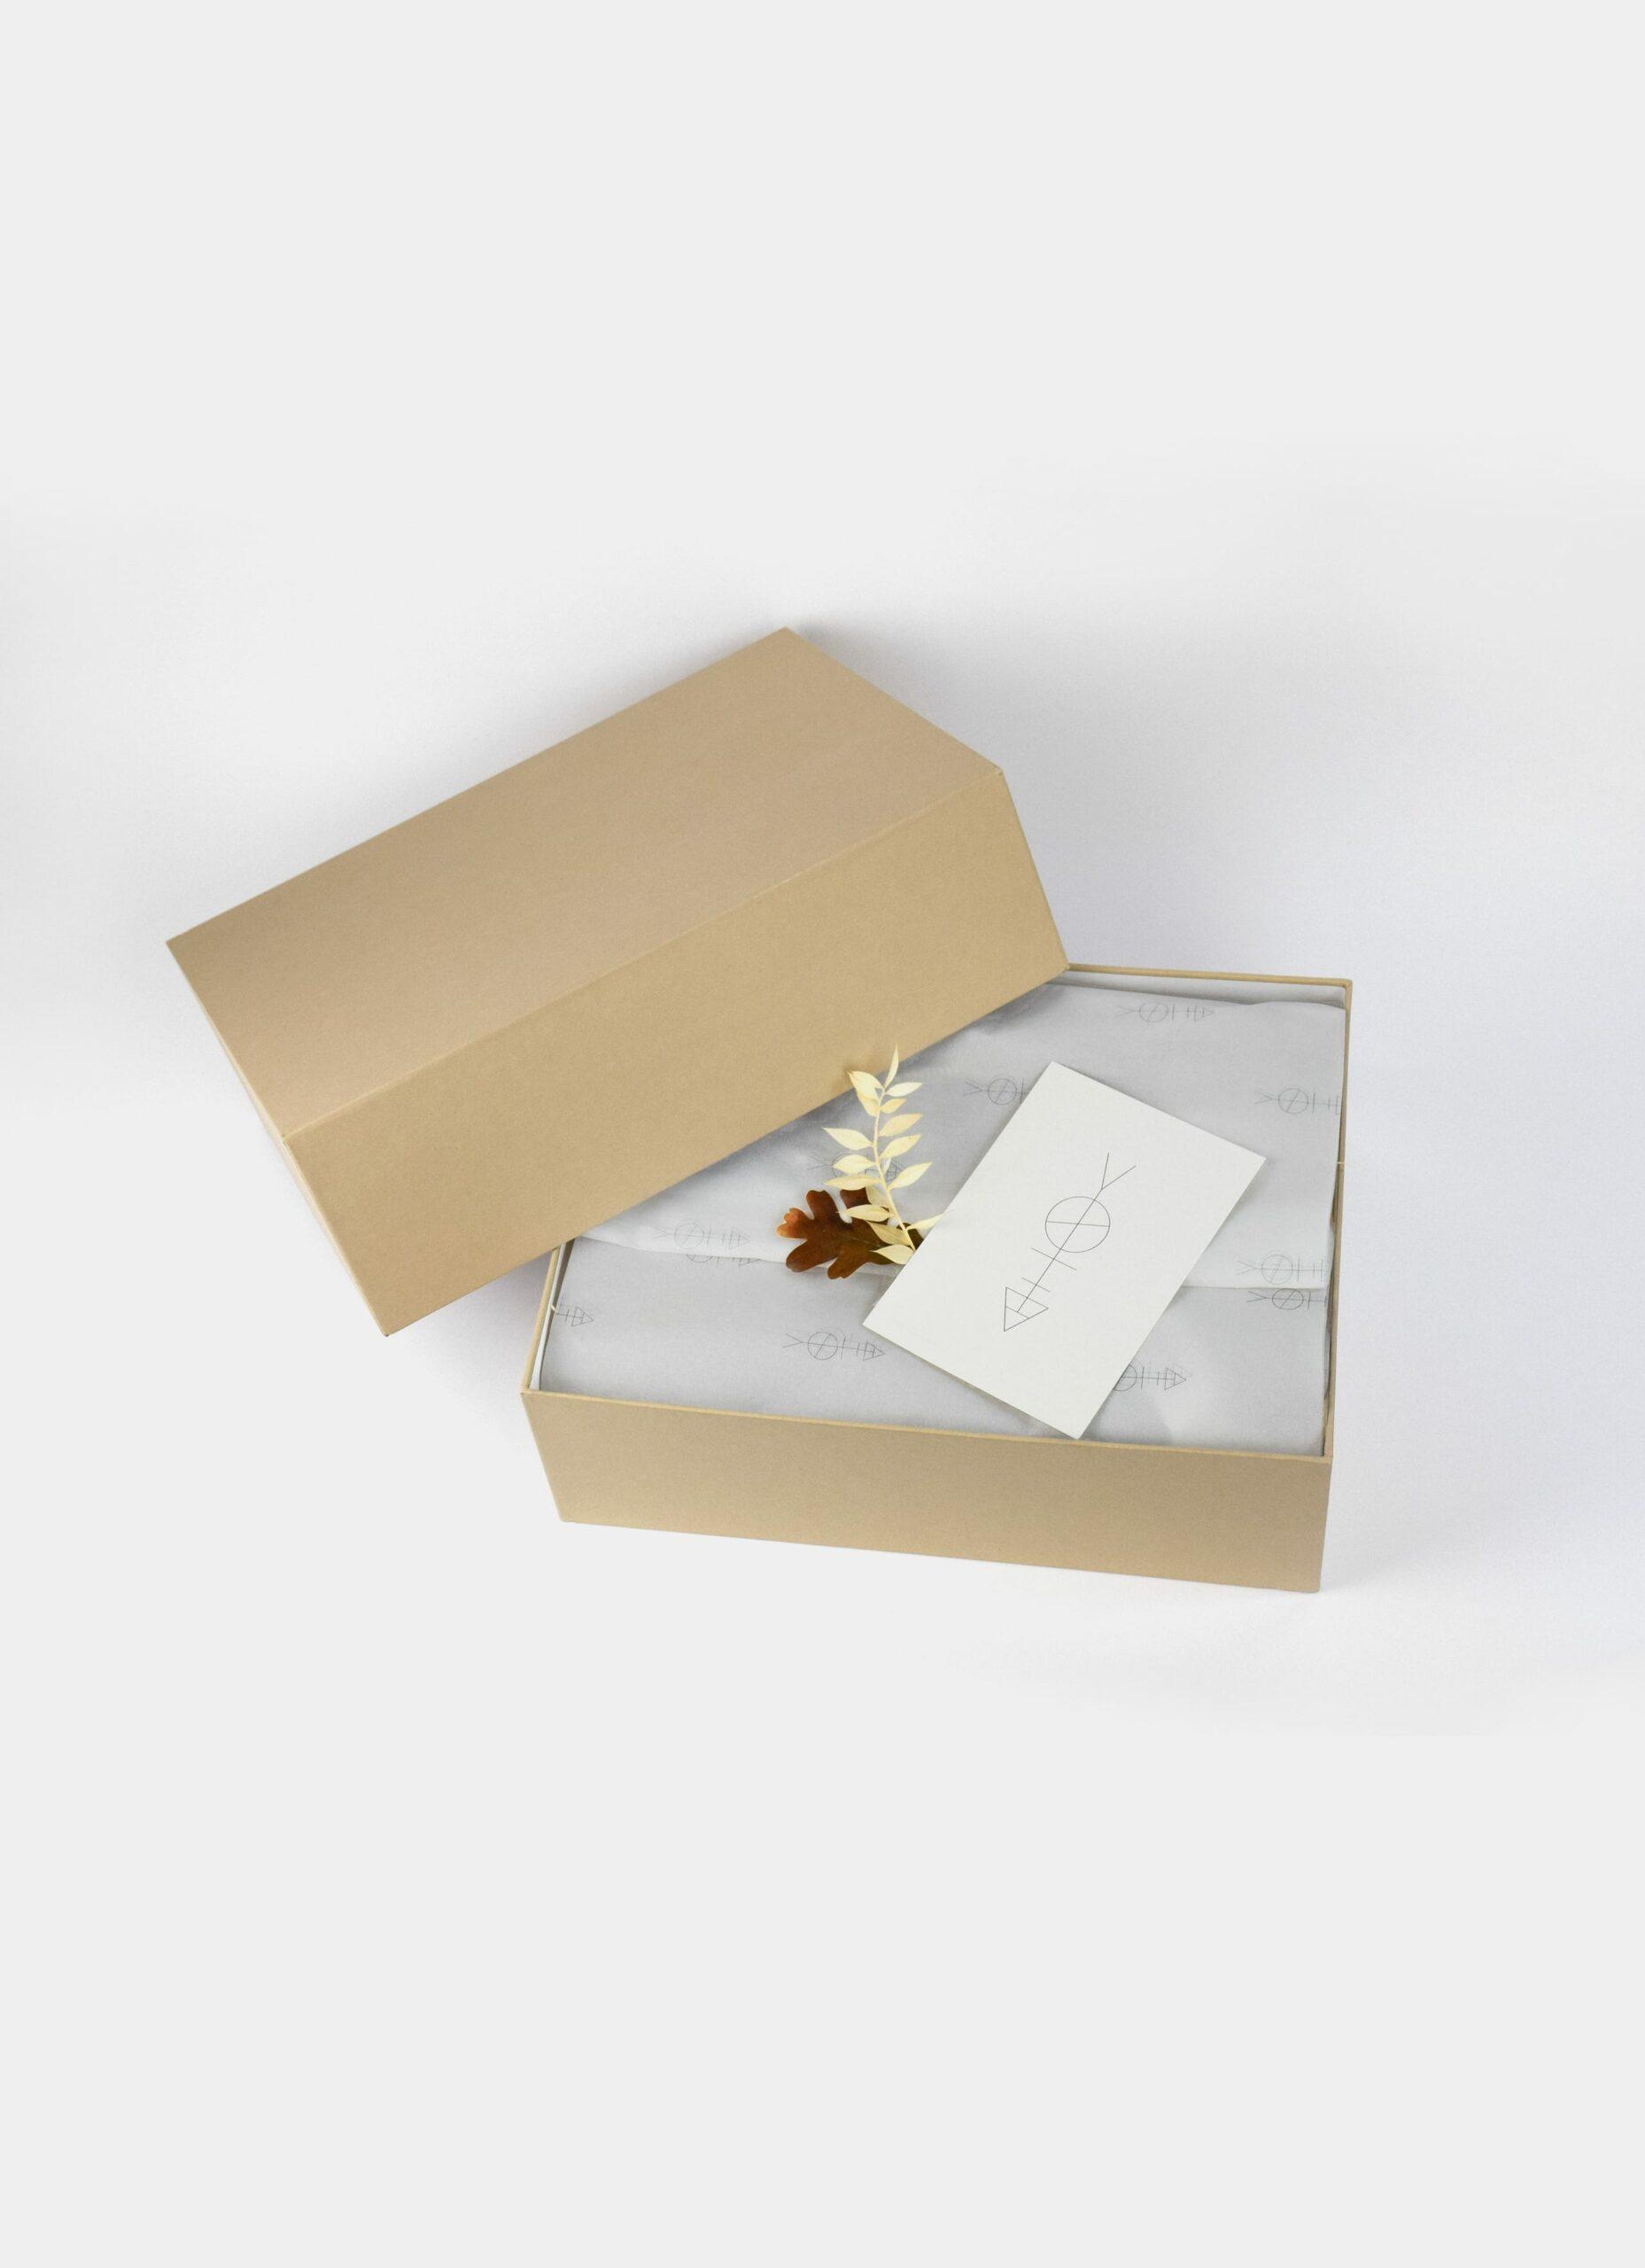 Volta - Gift Set for Tea Lovers